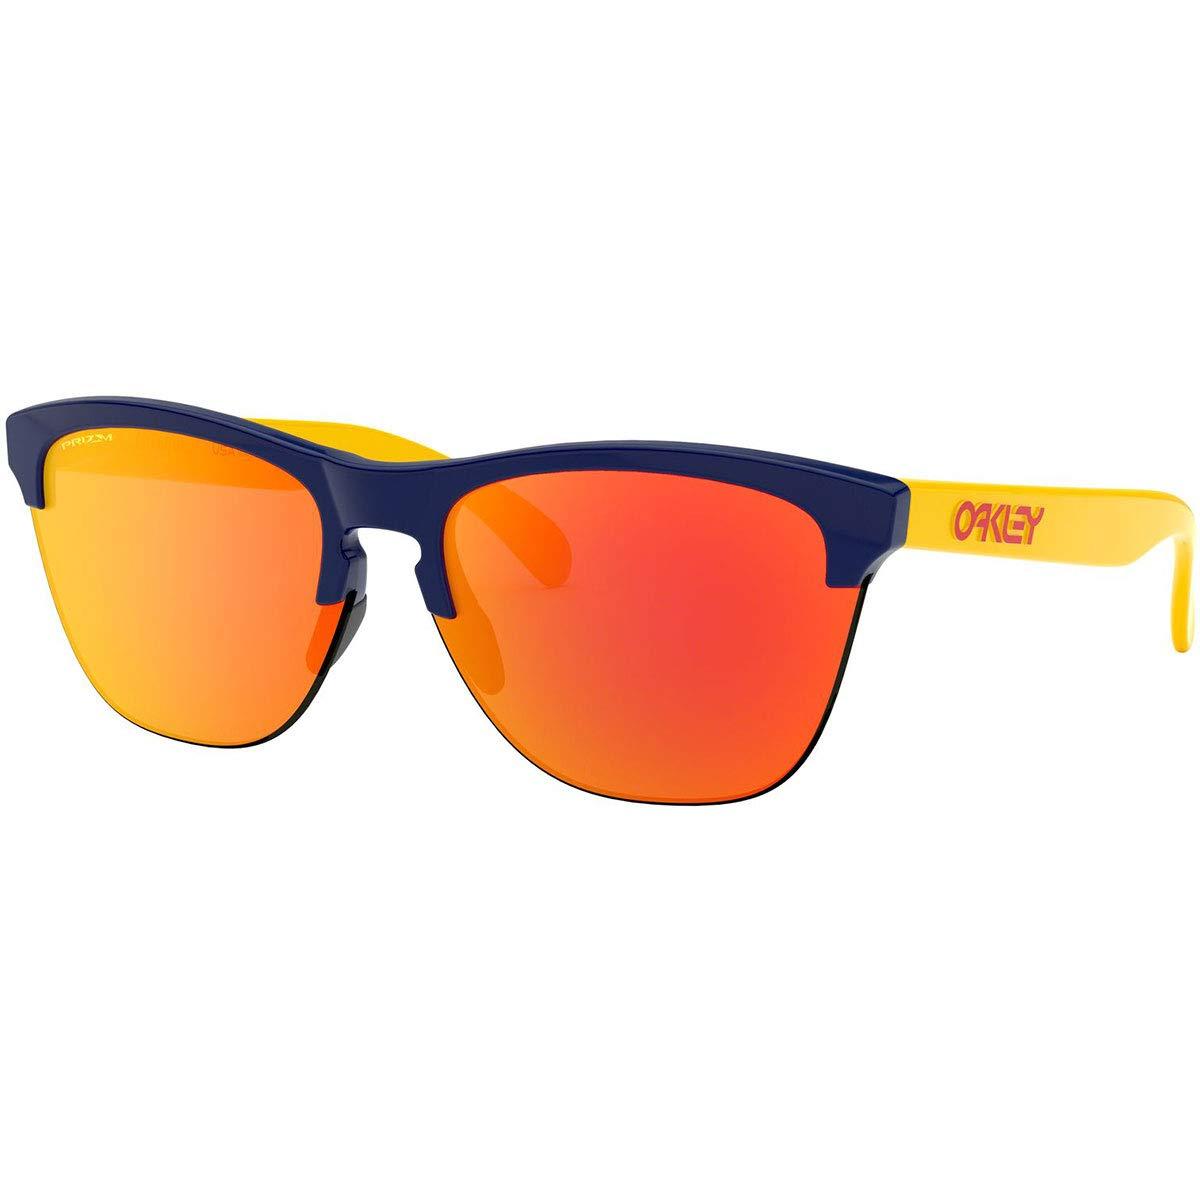 Oakley Men's OO9374 Frogskins Lite Round Sunglasses, Navy/Prizm Ruby, 63 mm by Oakley